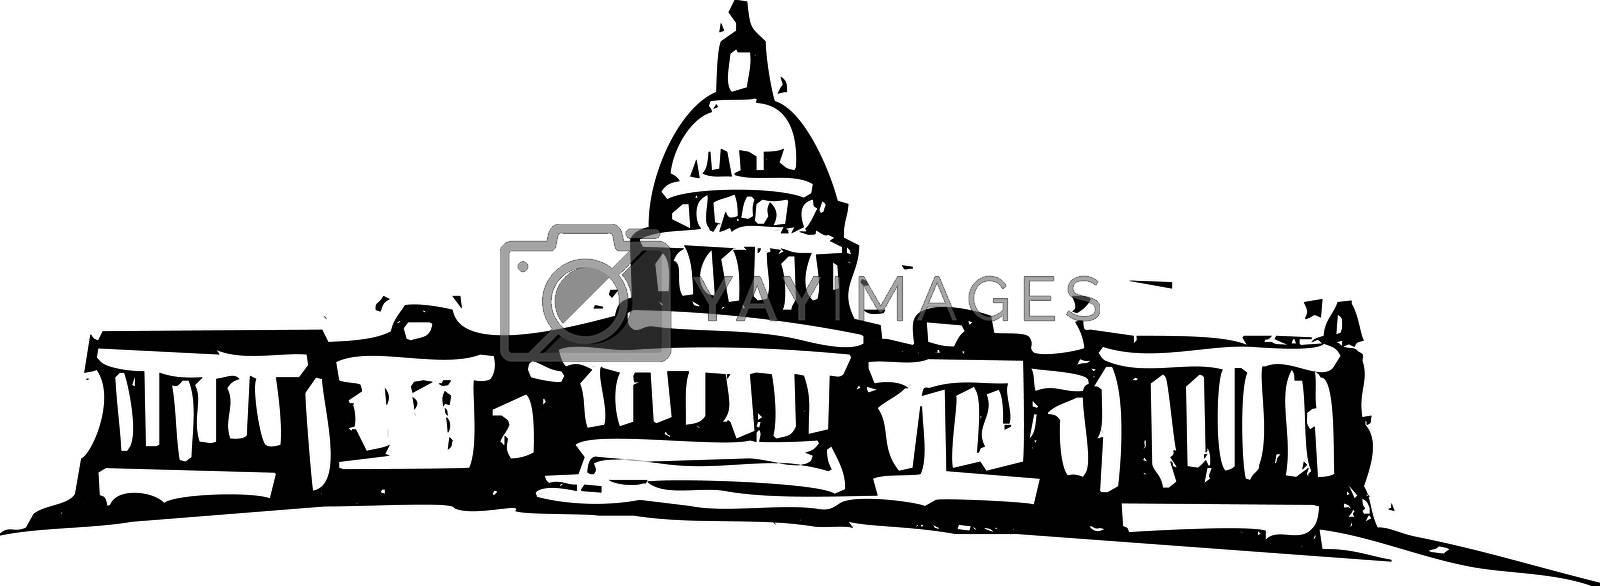 Black and White woodcut style illustration of the Washington DC Captial building.